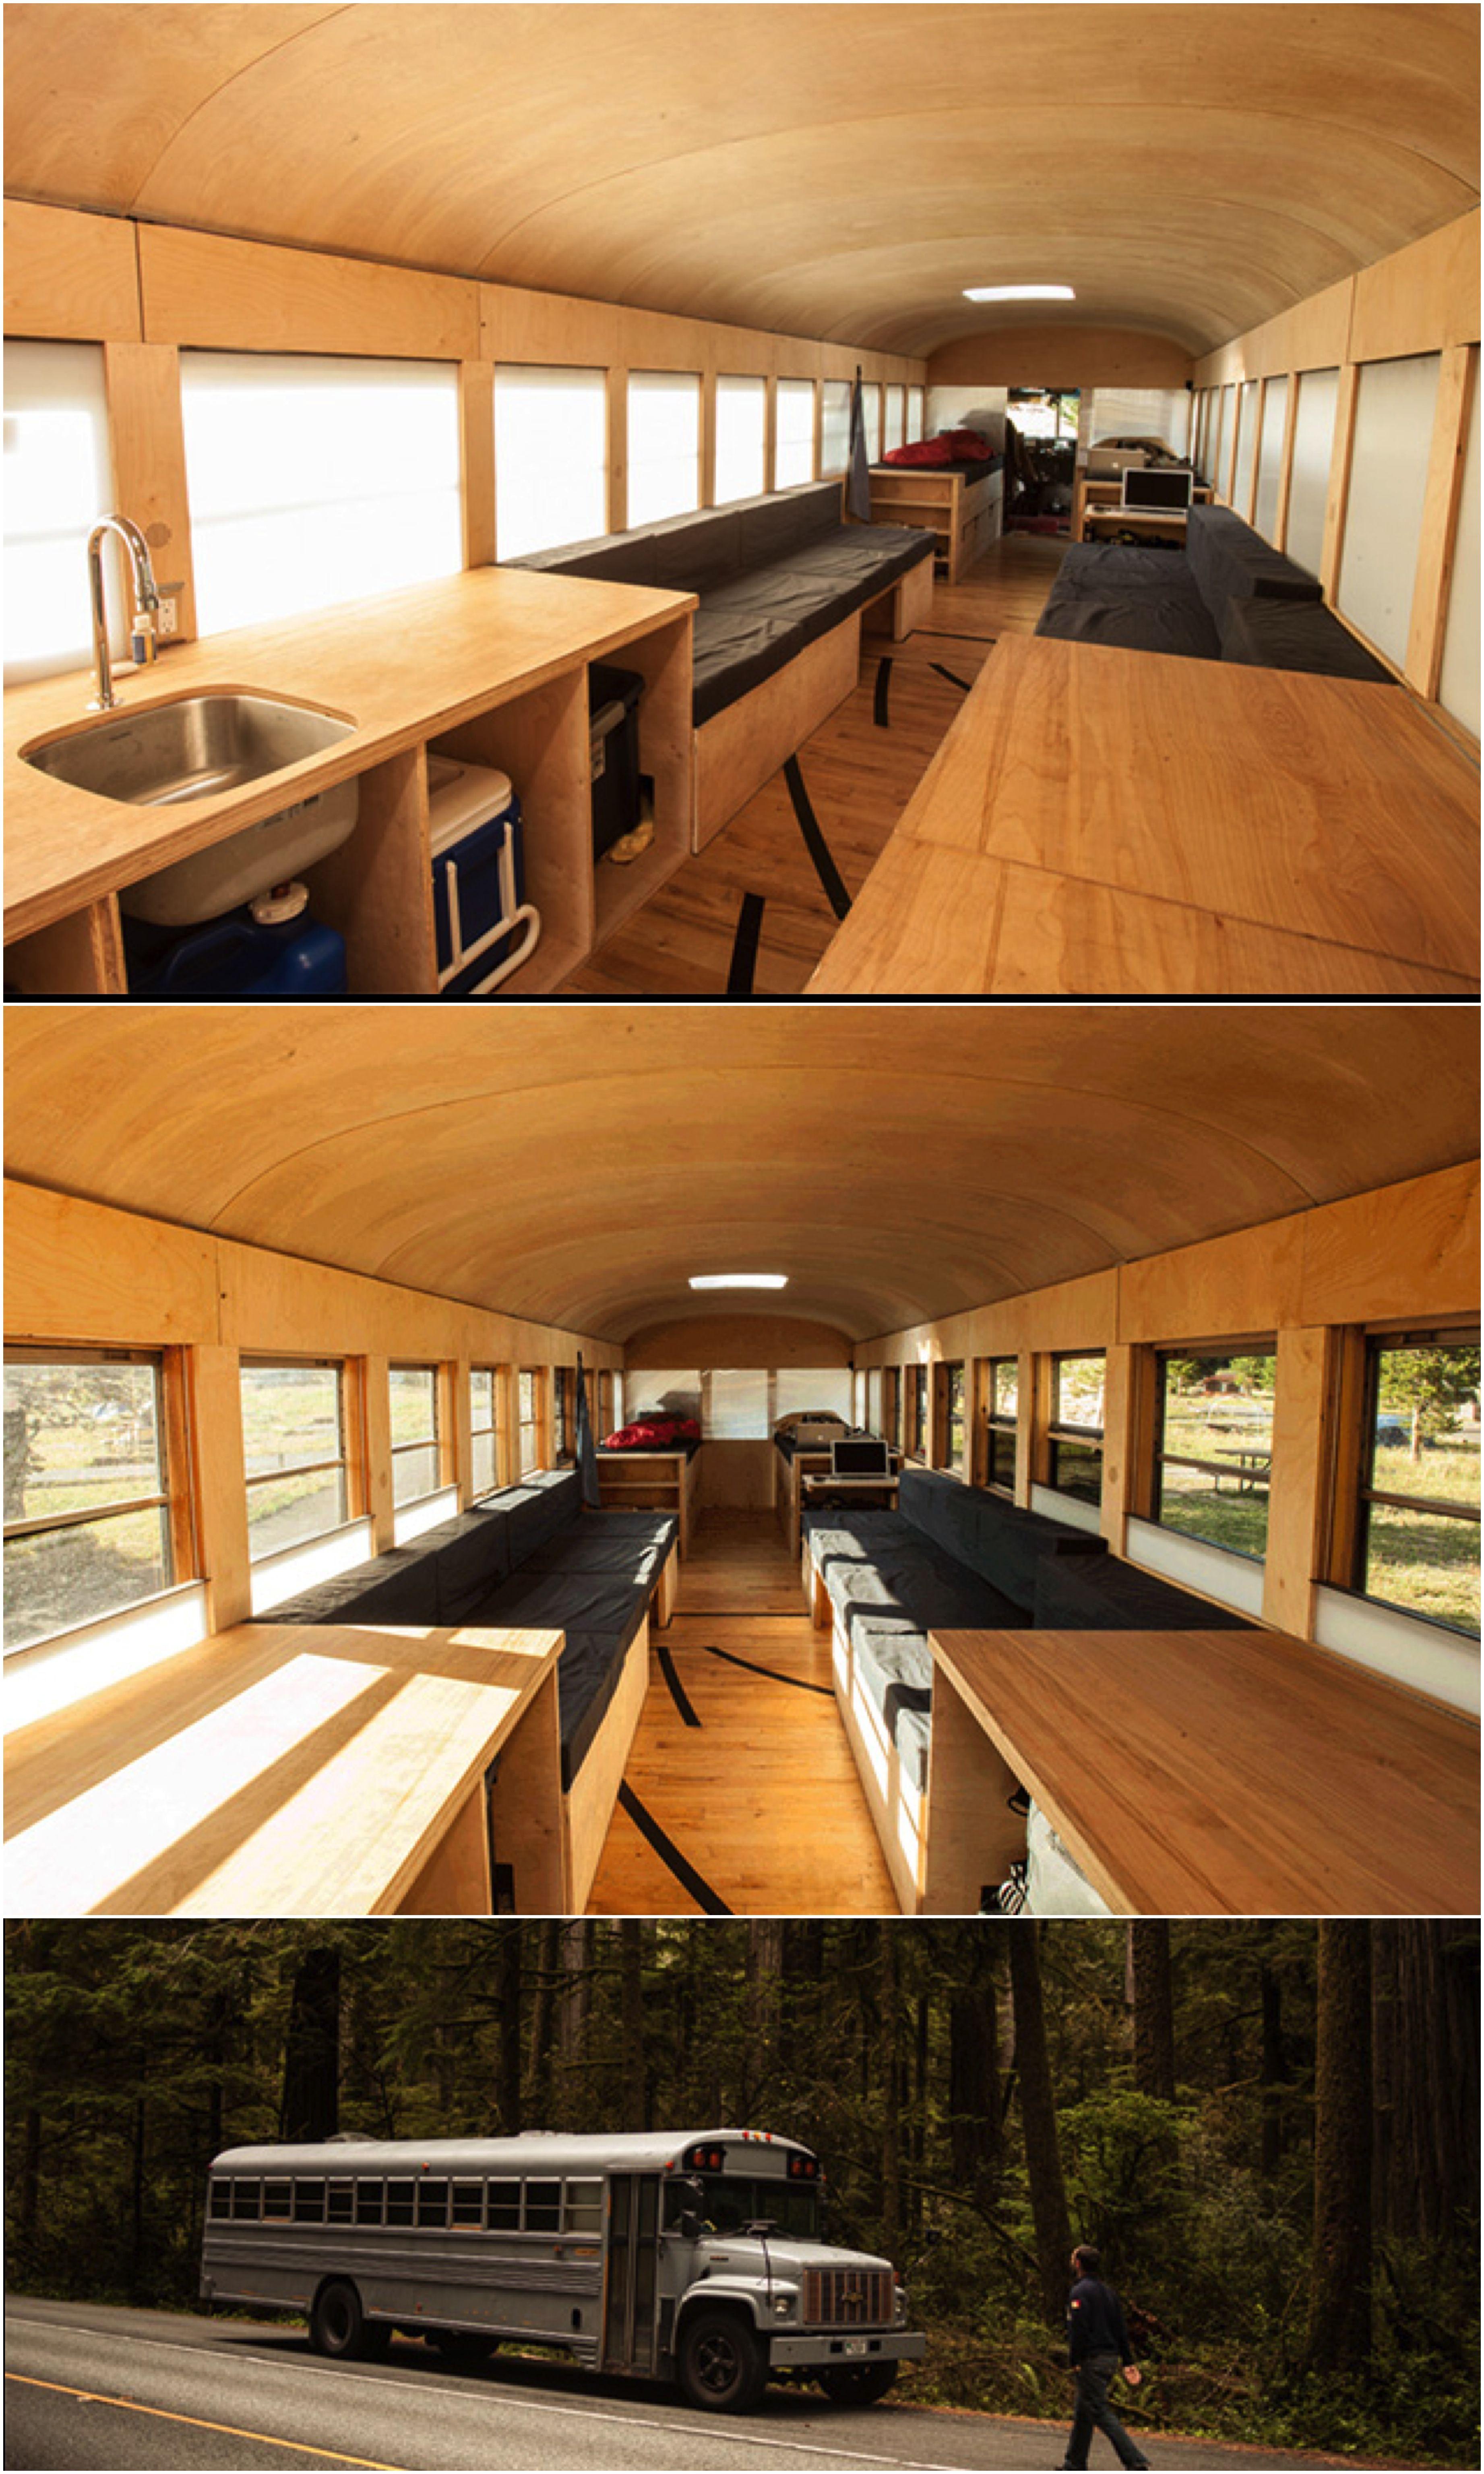 Savanna Interior Diy Mini Pond: Architecture Student Converts Old Bus Into Comfy Mobile